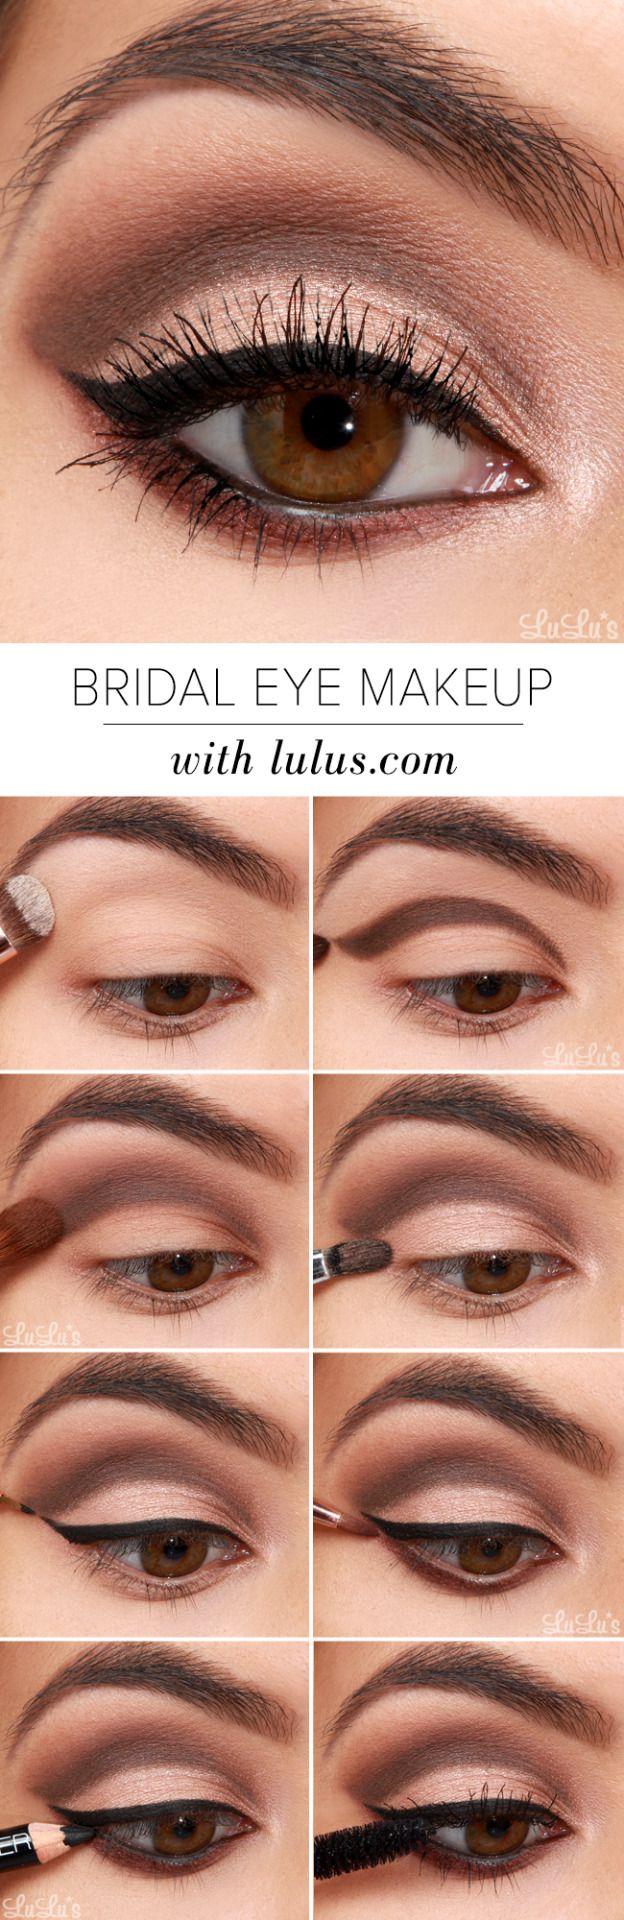 Lulus How To Bridal Eye Makeup Tutorial Makeup Beauty Tricks